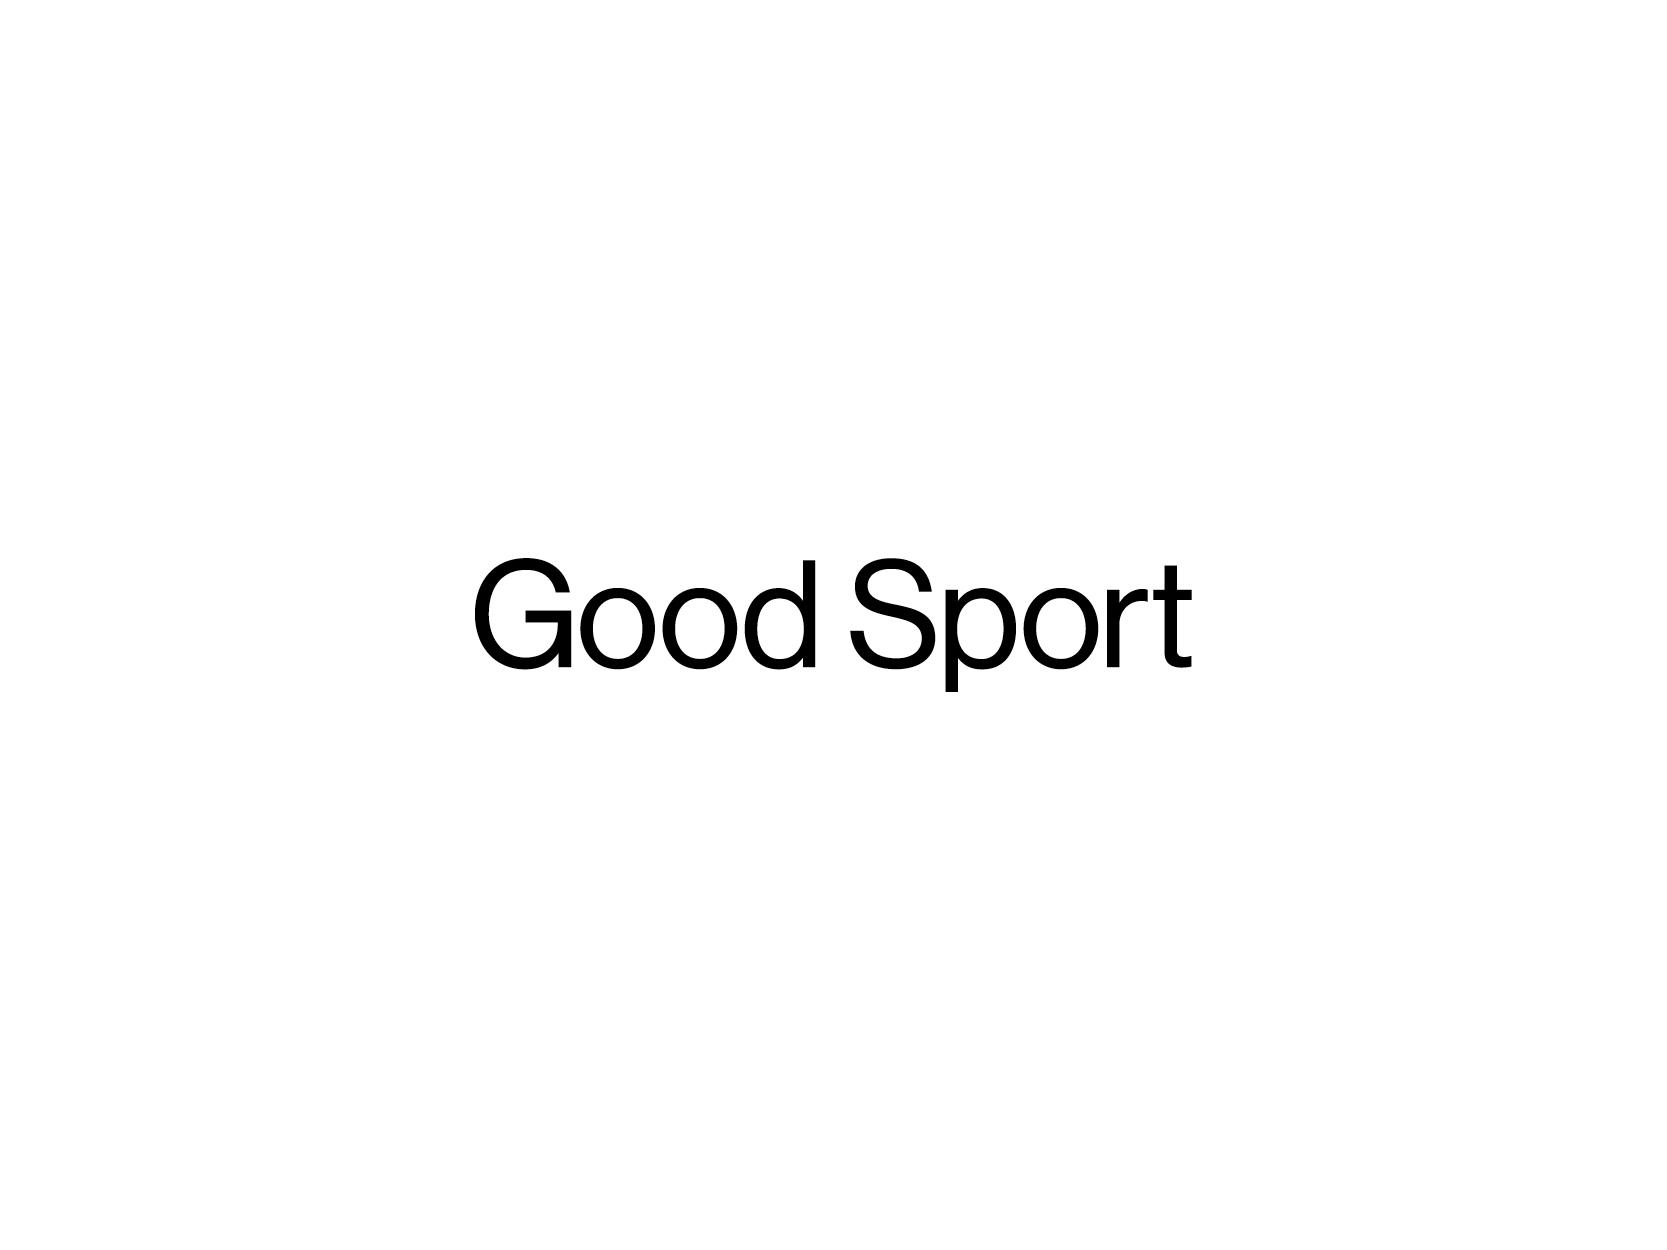 Good Sport